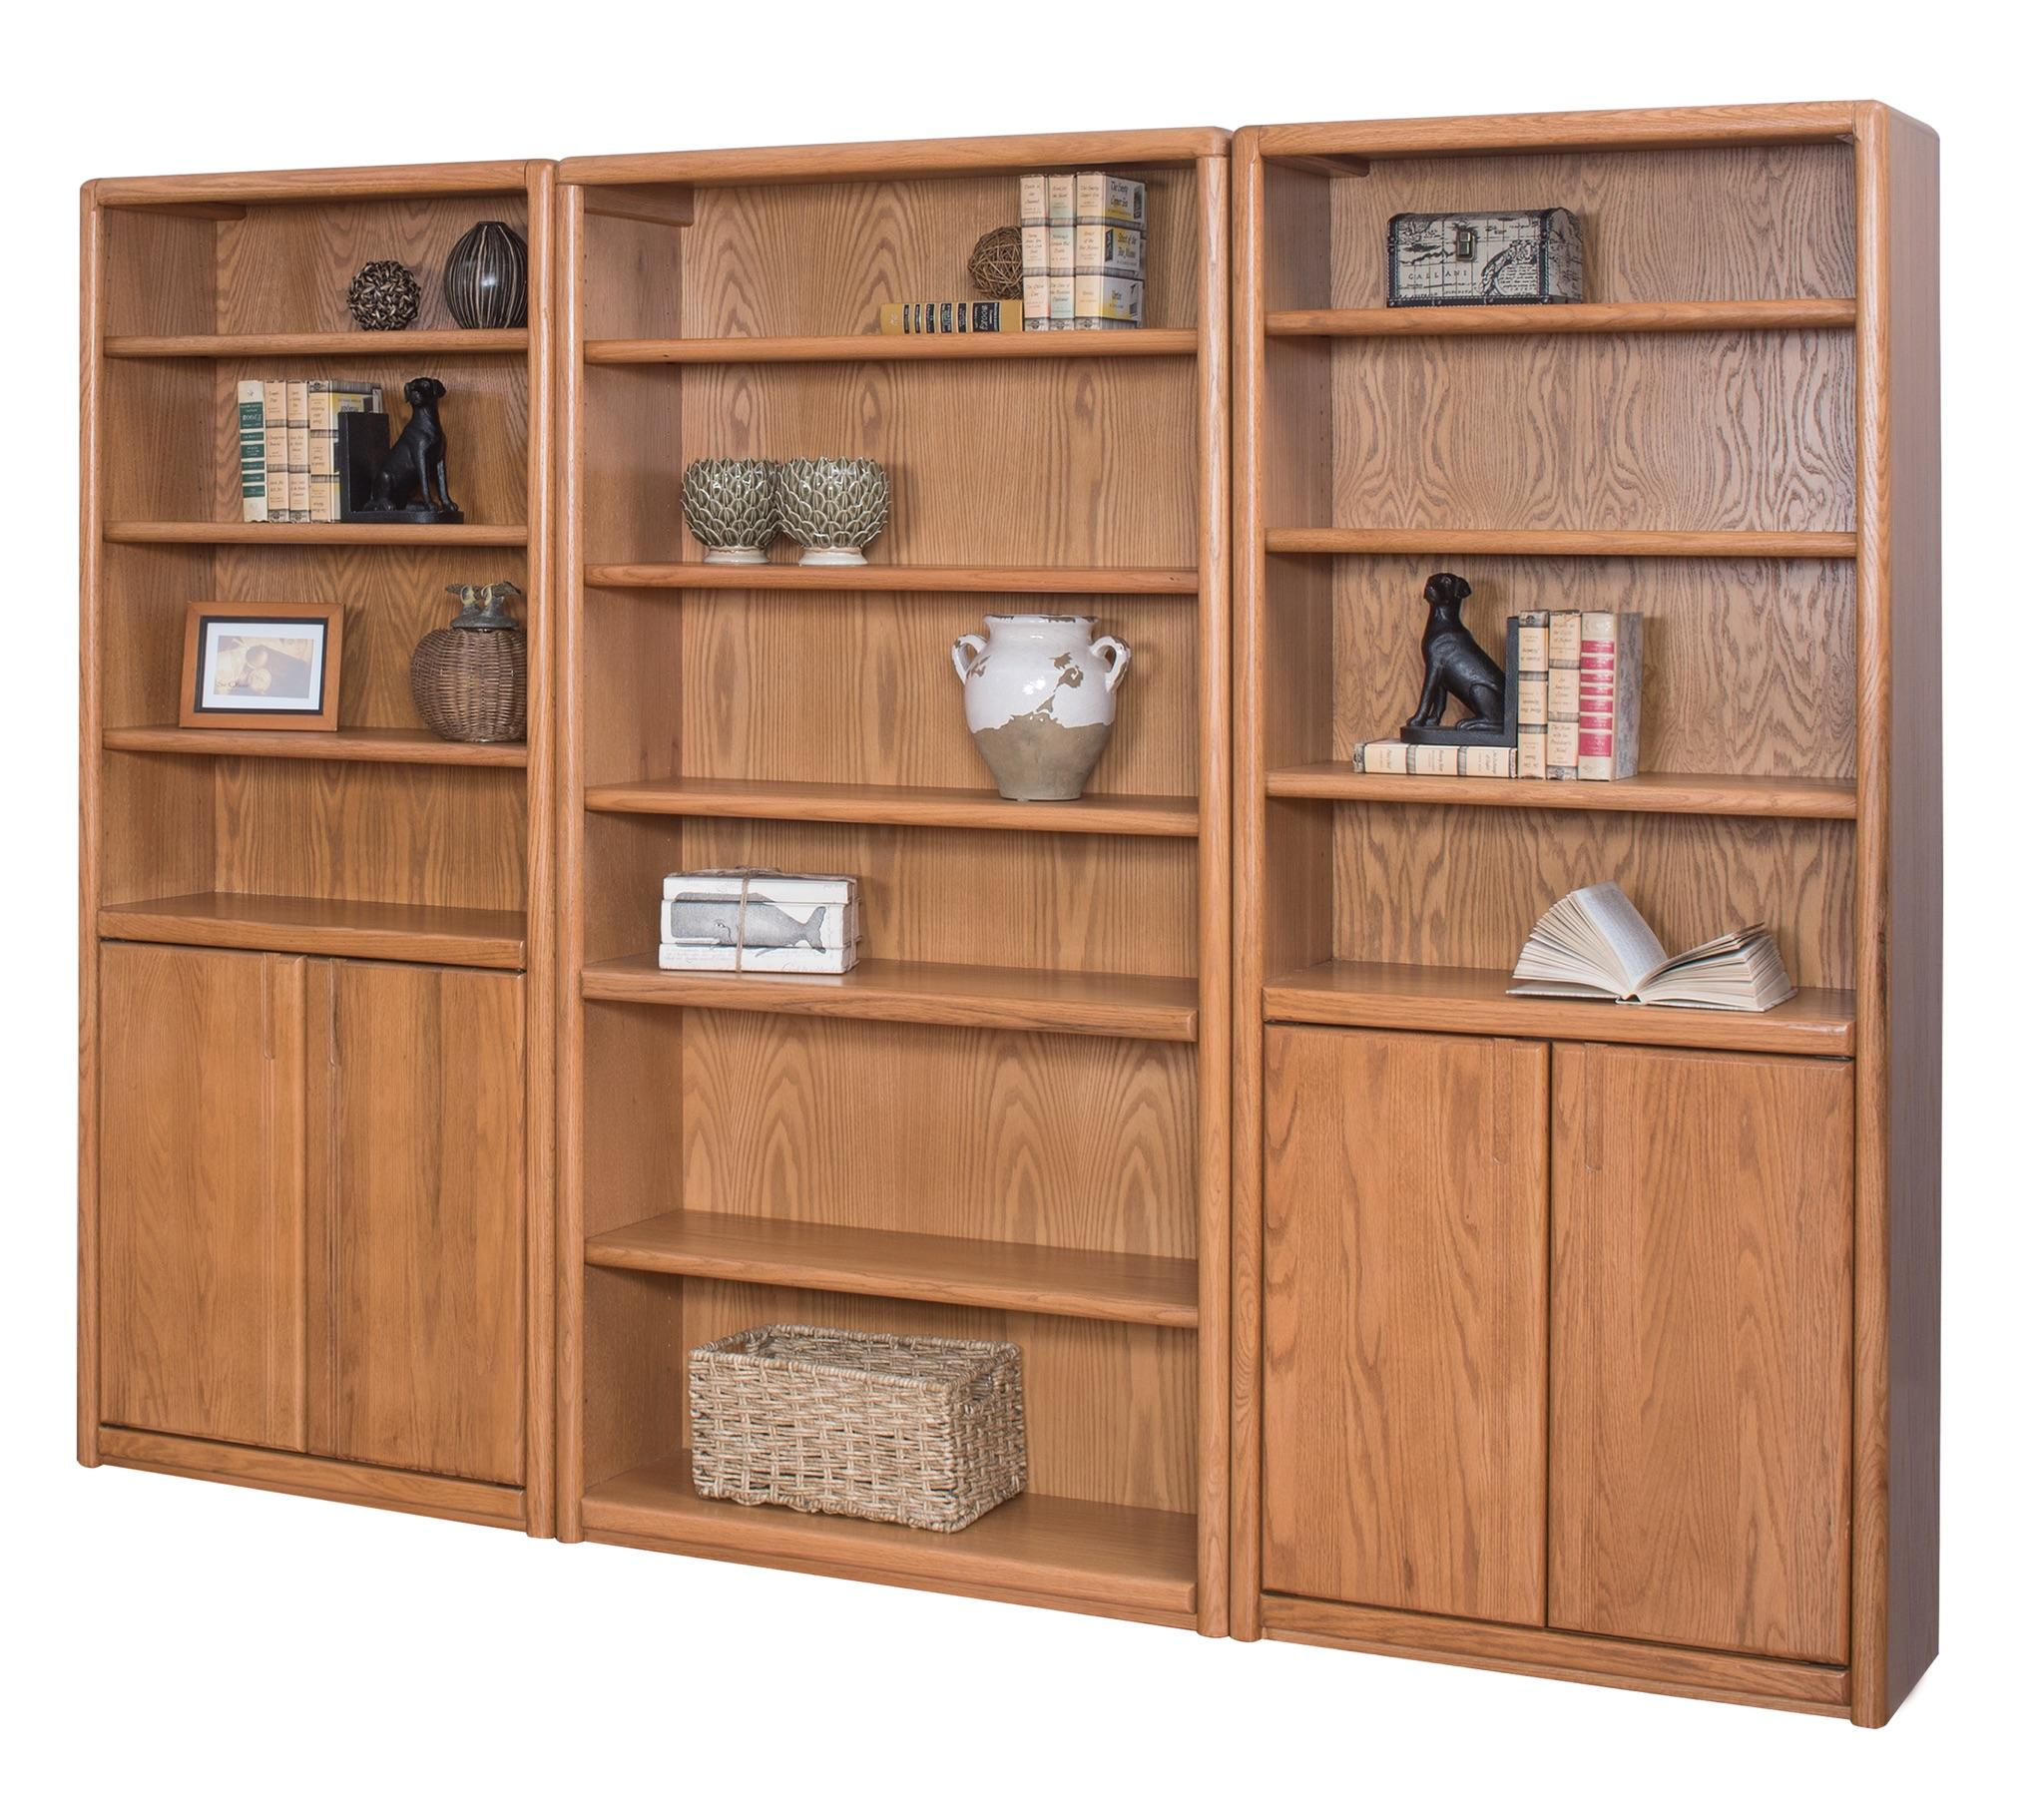 martin furniture imte4094x3 imte402 toulouse 3. Black Bedroom Furniture Sets. Home Design Ideas